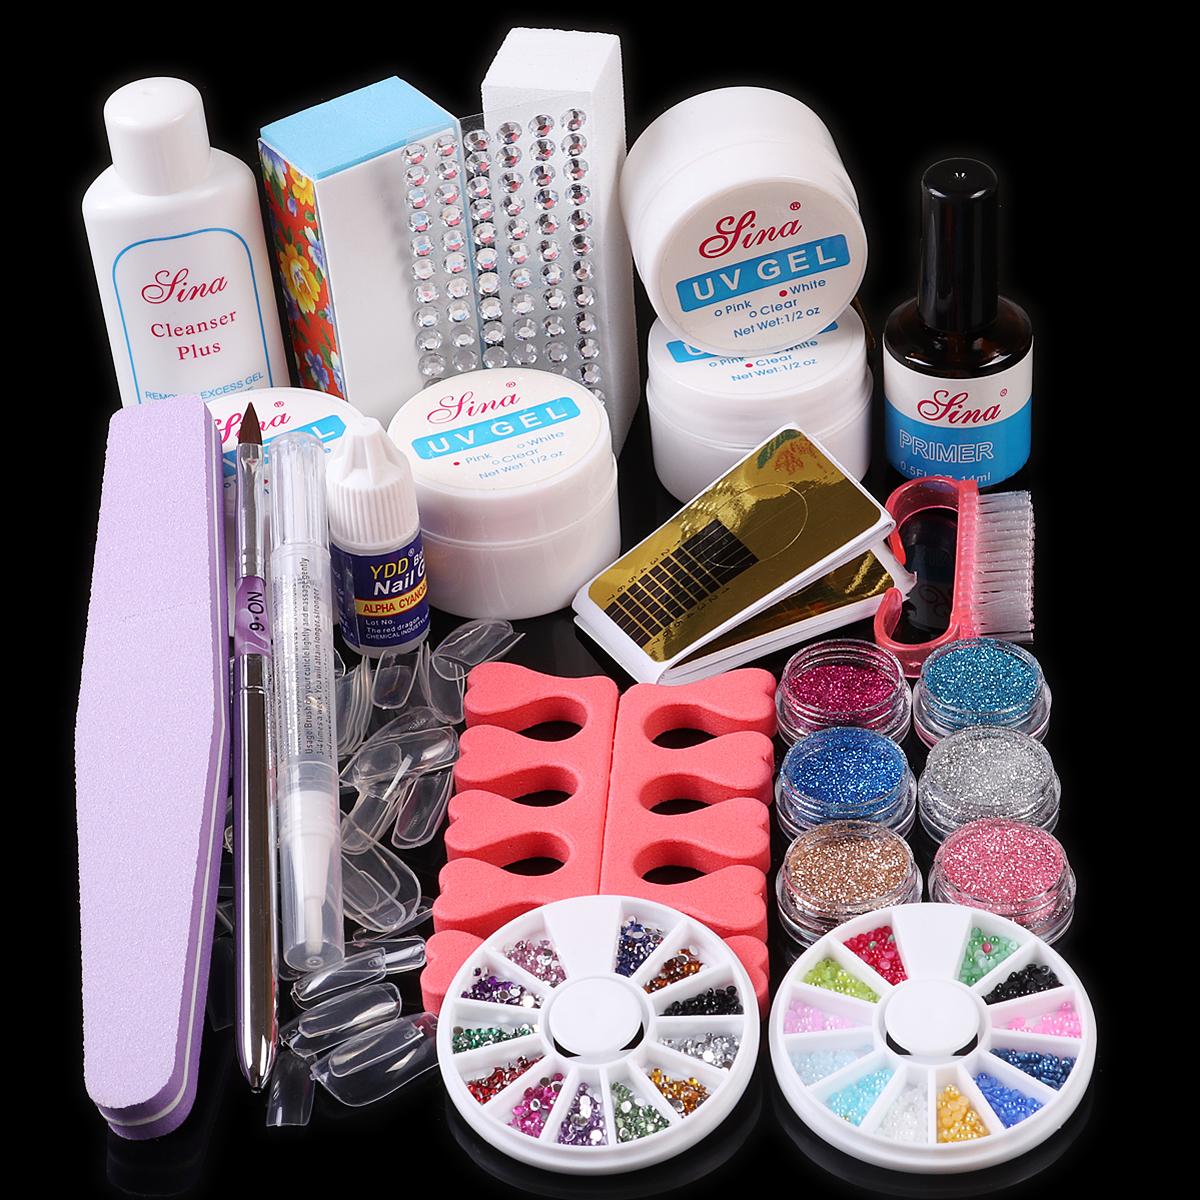 wholesale Nail Art Acrylic UV Gel Top Coat Cleanser Powder Glue Brush File Guide Forms Rhinestones Decoration False Nail Tips Set Kit